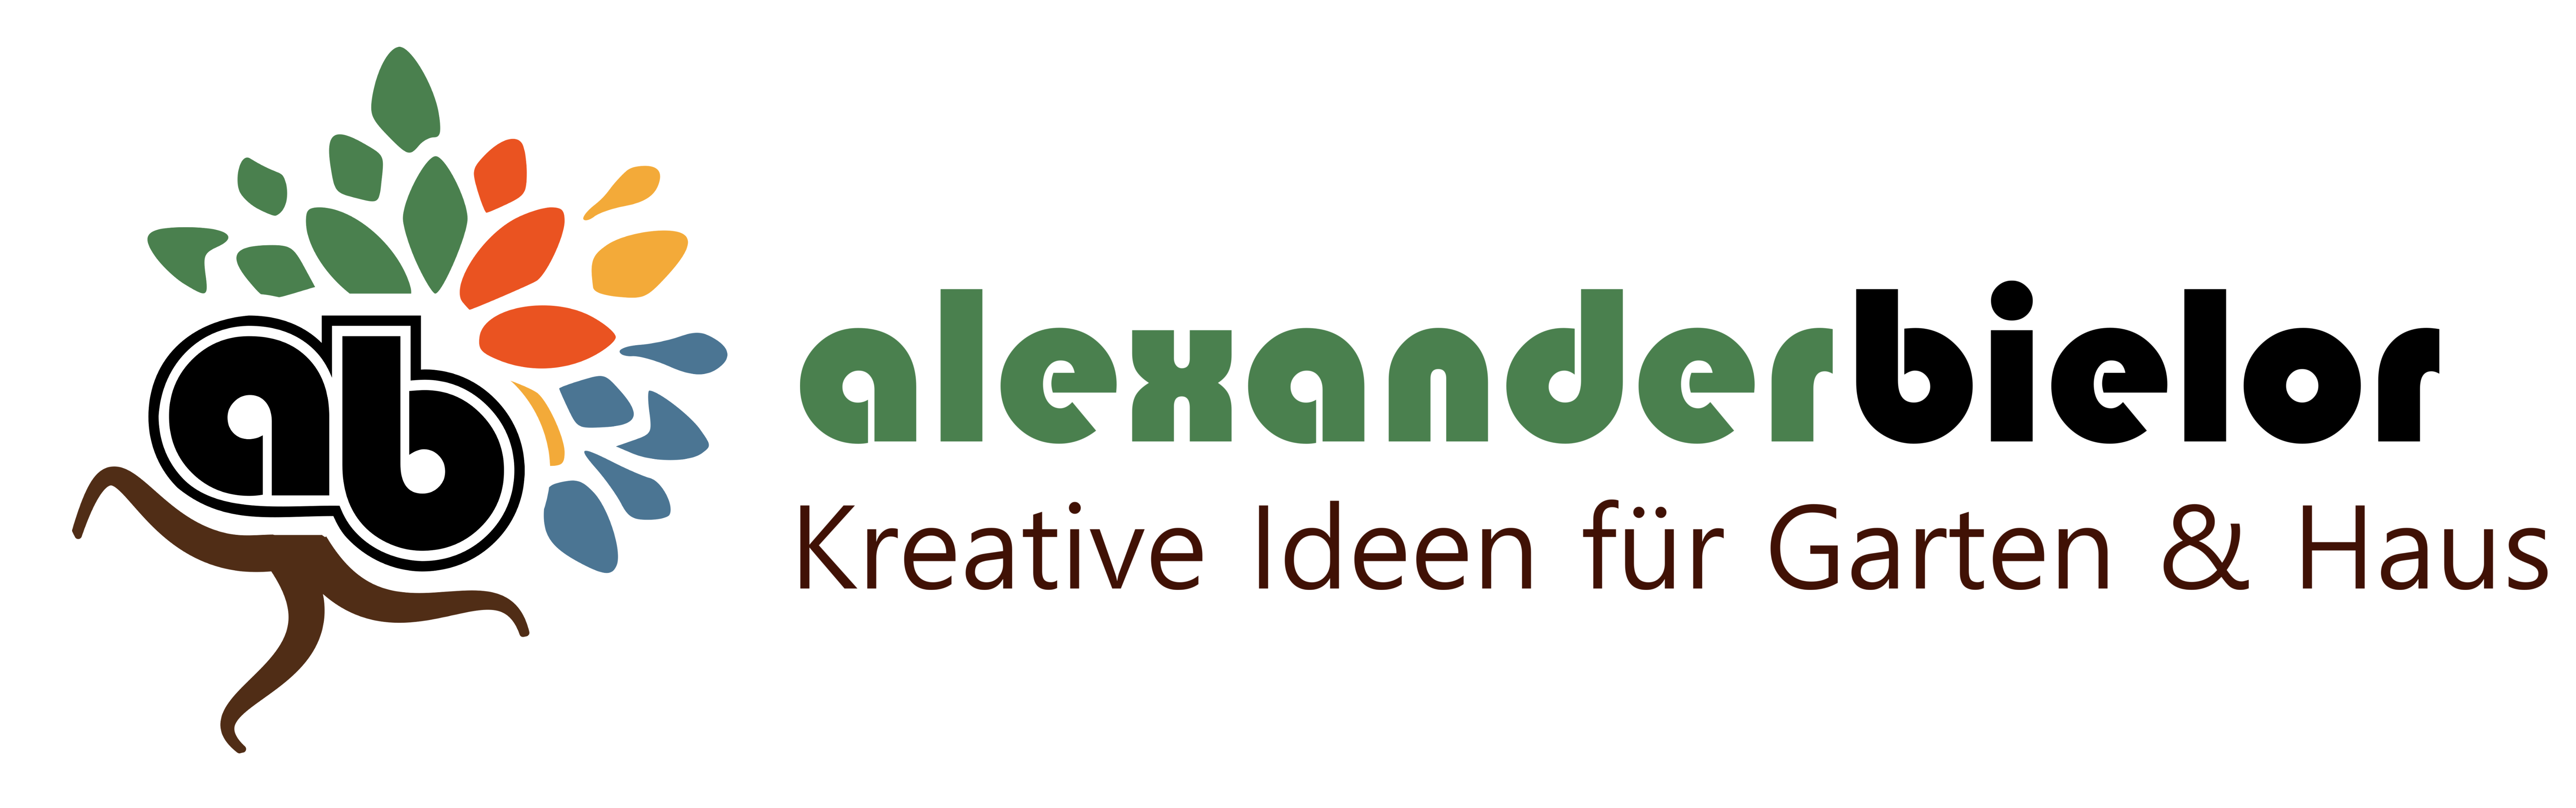 Logo Alexander Bielor